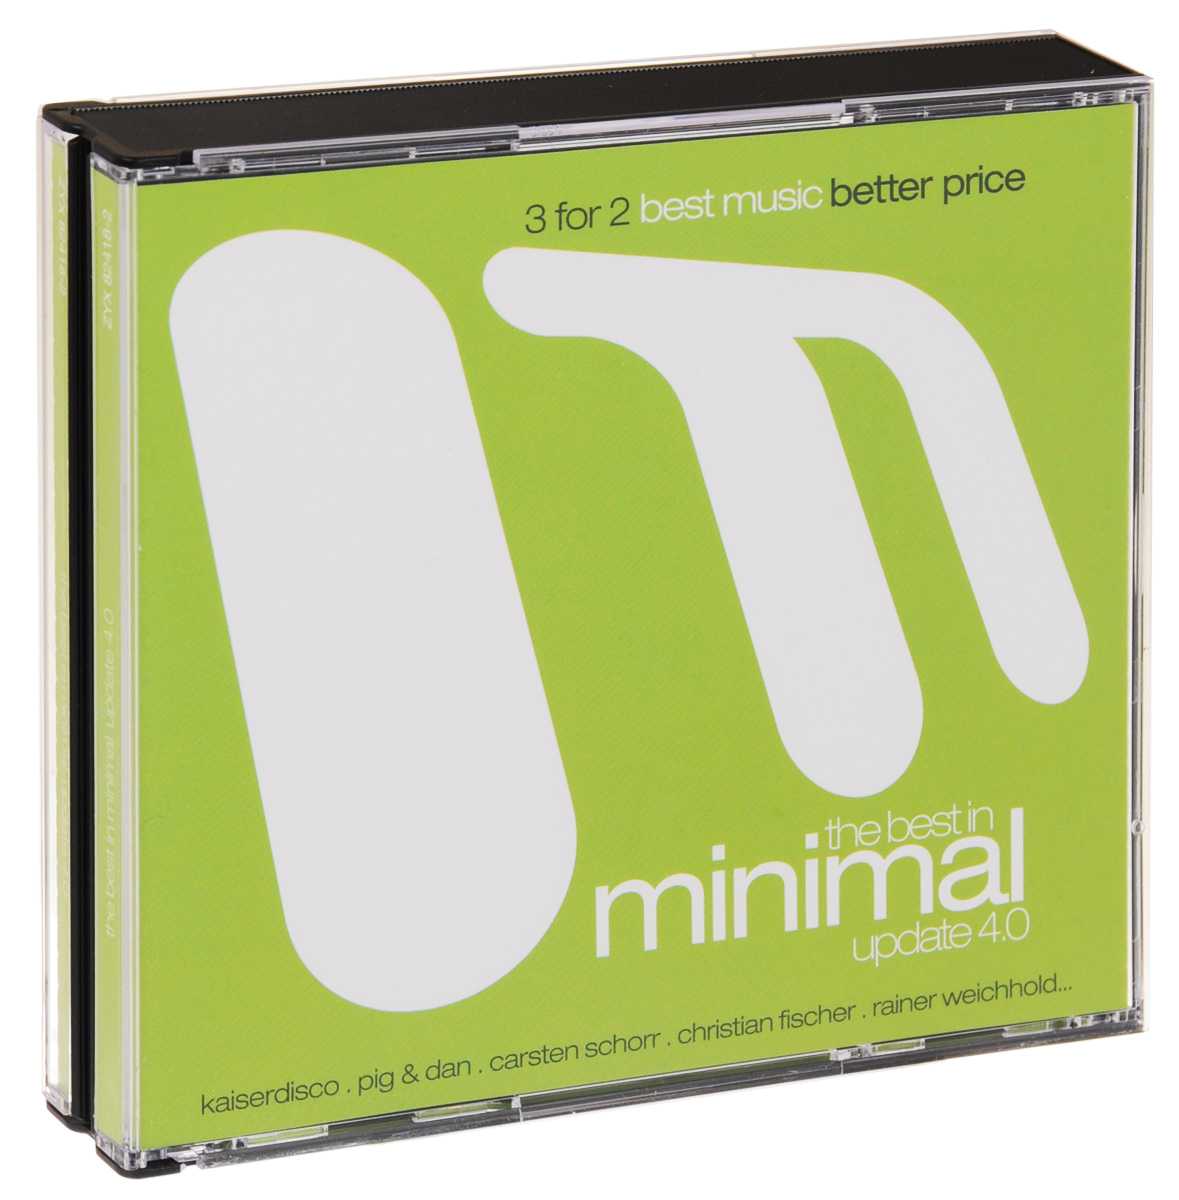 The Best In Minimal Update 4.0 (3 CD) михаил плетнев филип лейджер роджер норрингтон джон нельсон сабин мейер best adagios 50 3 cd